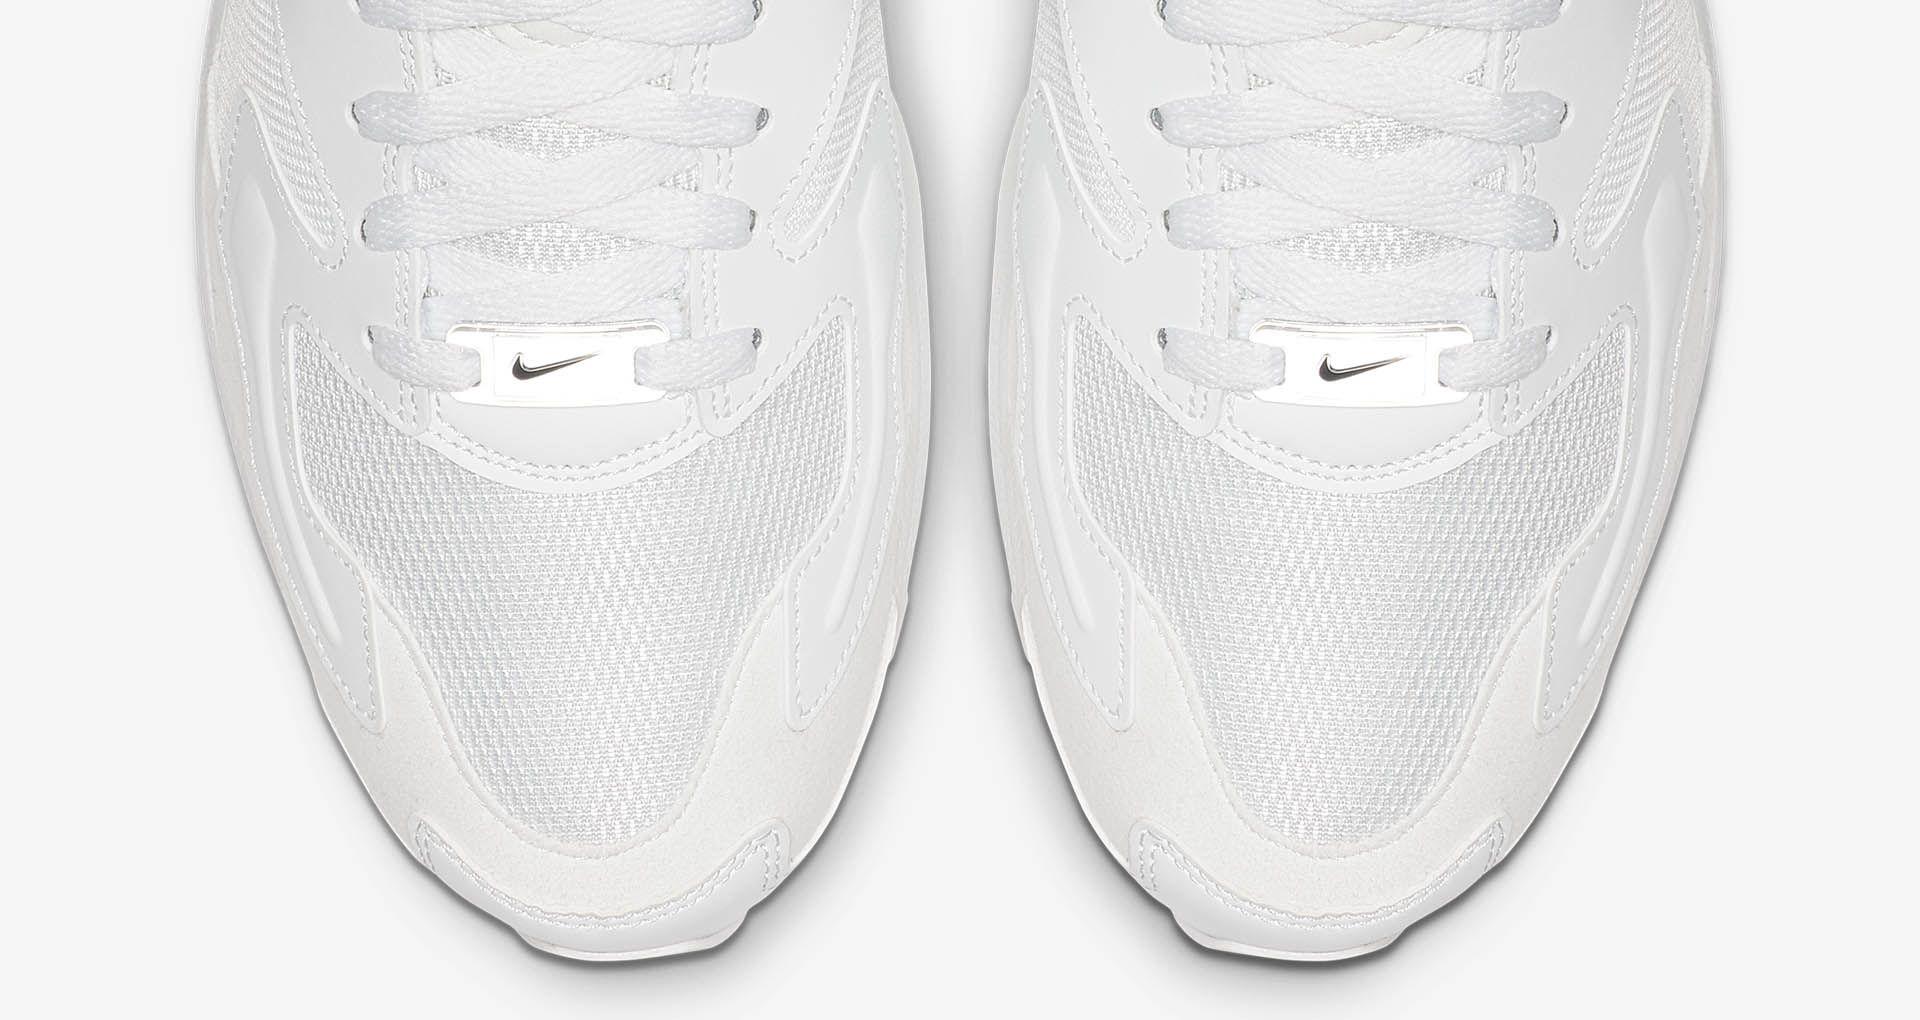 08-nike-air-max2-light-triple-white-ao1741-102